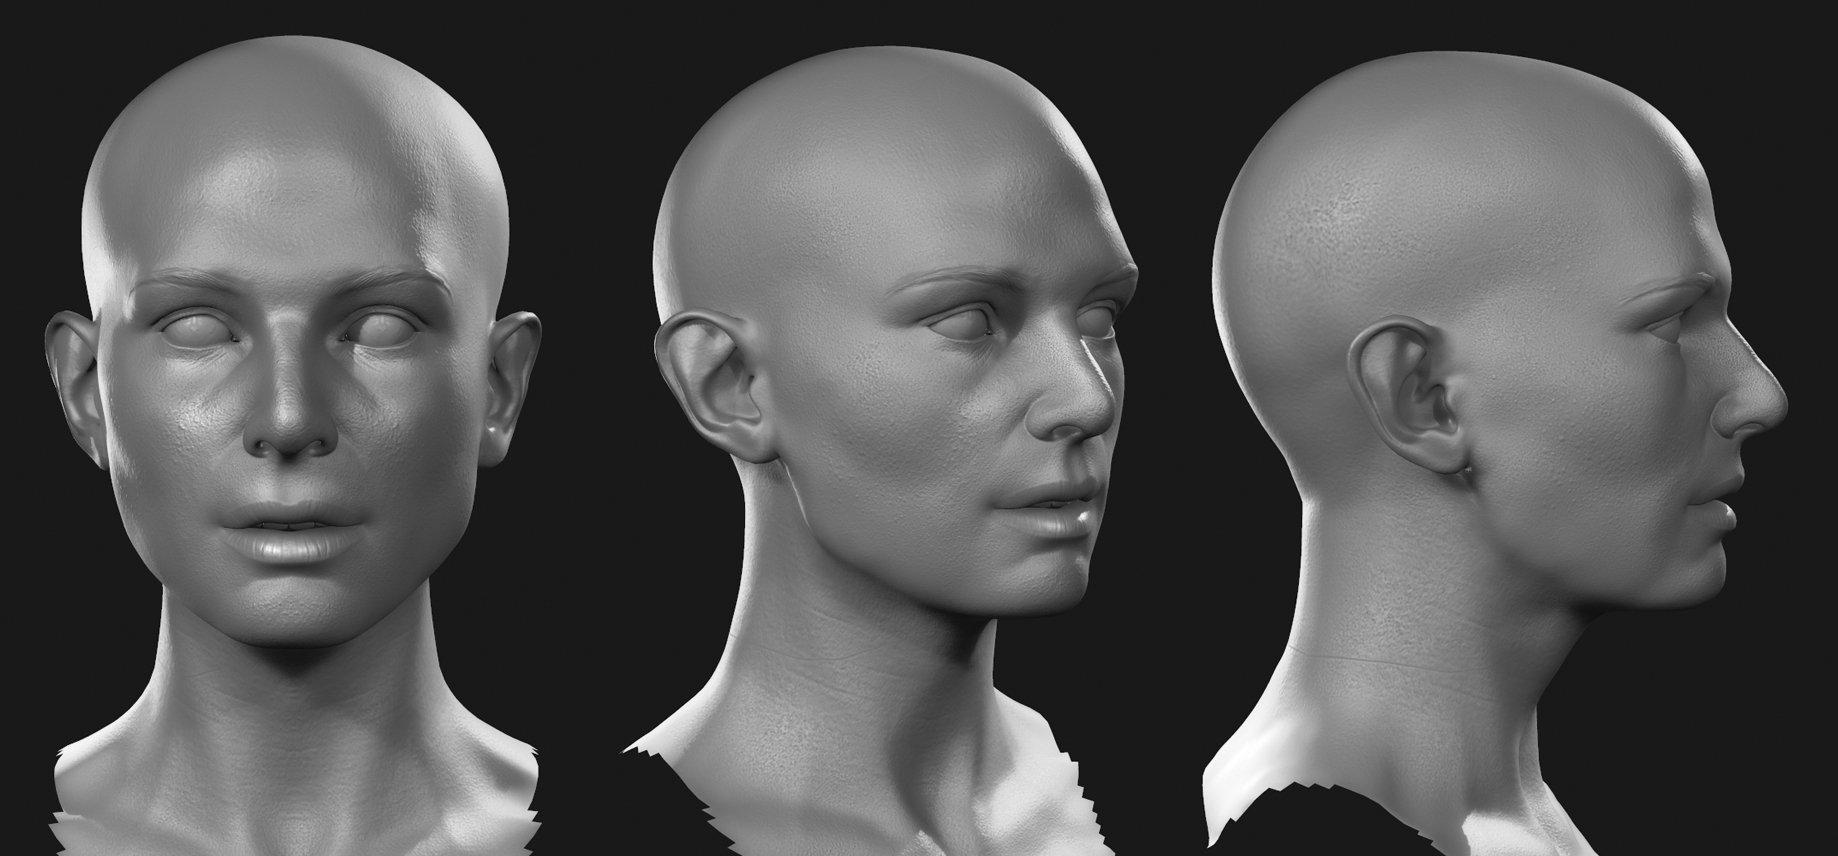 ArtStation - Female head, Jon Berry